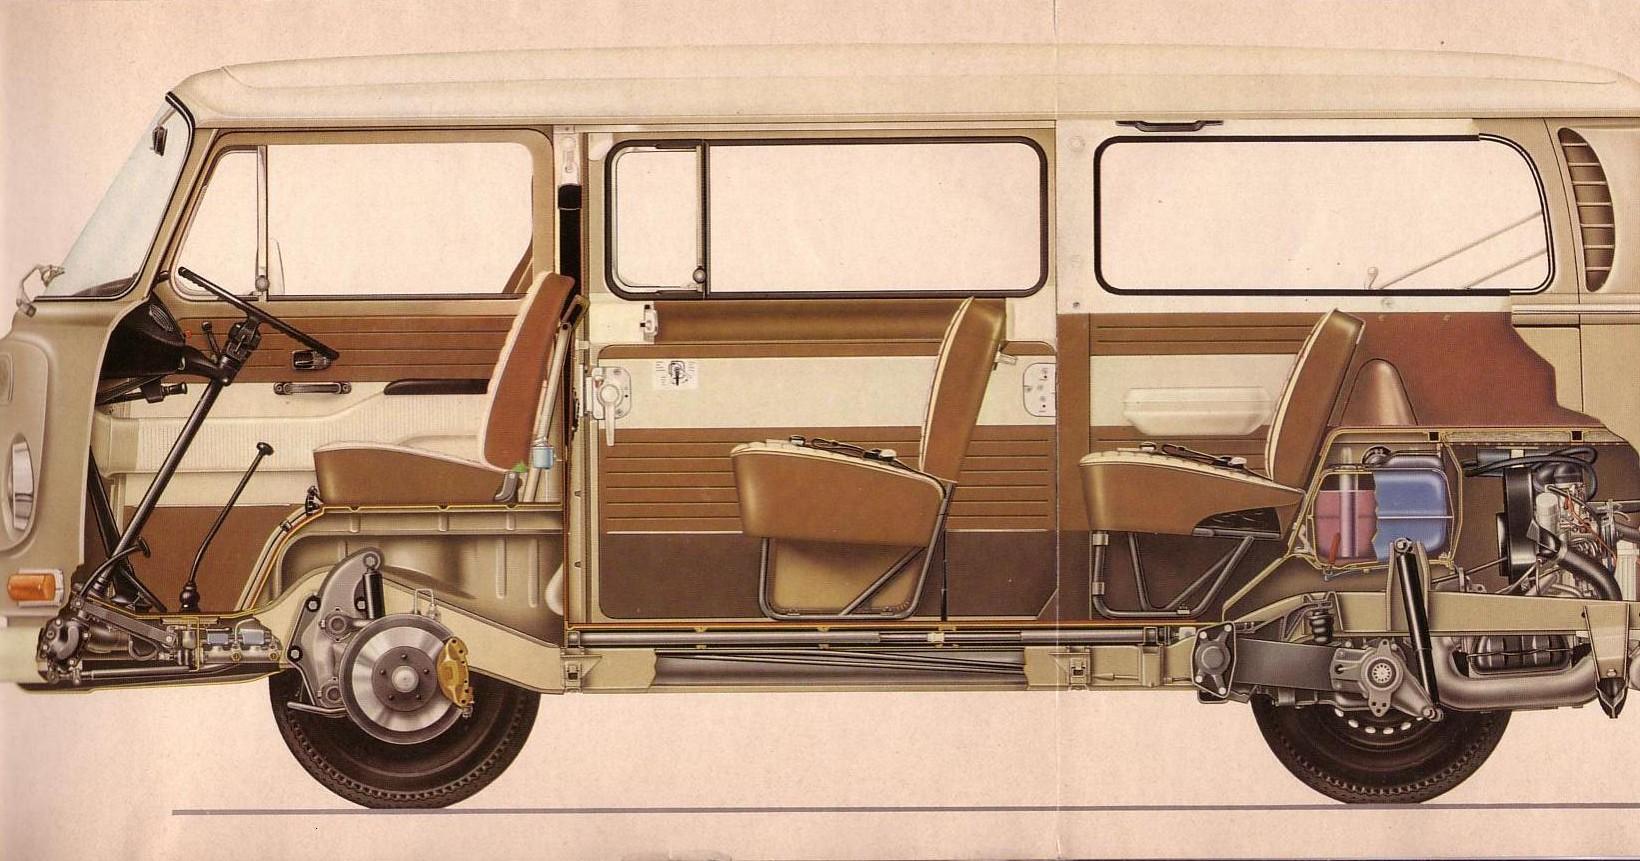 TheSamba.com :: Bay Window Bus - View topic - blueprints for VW Bus ...